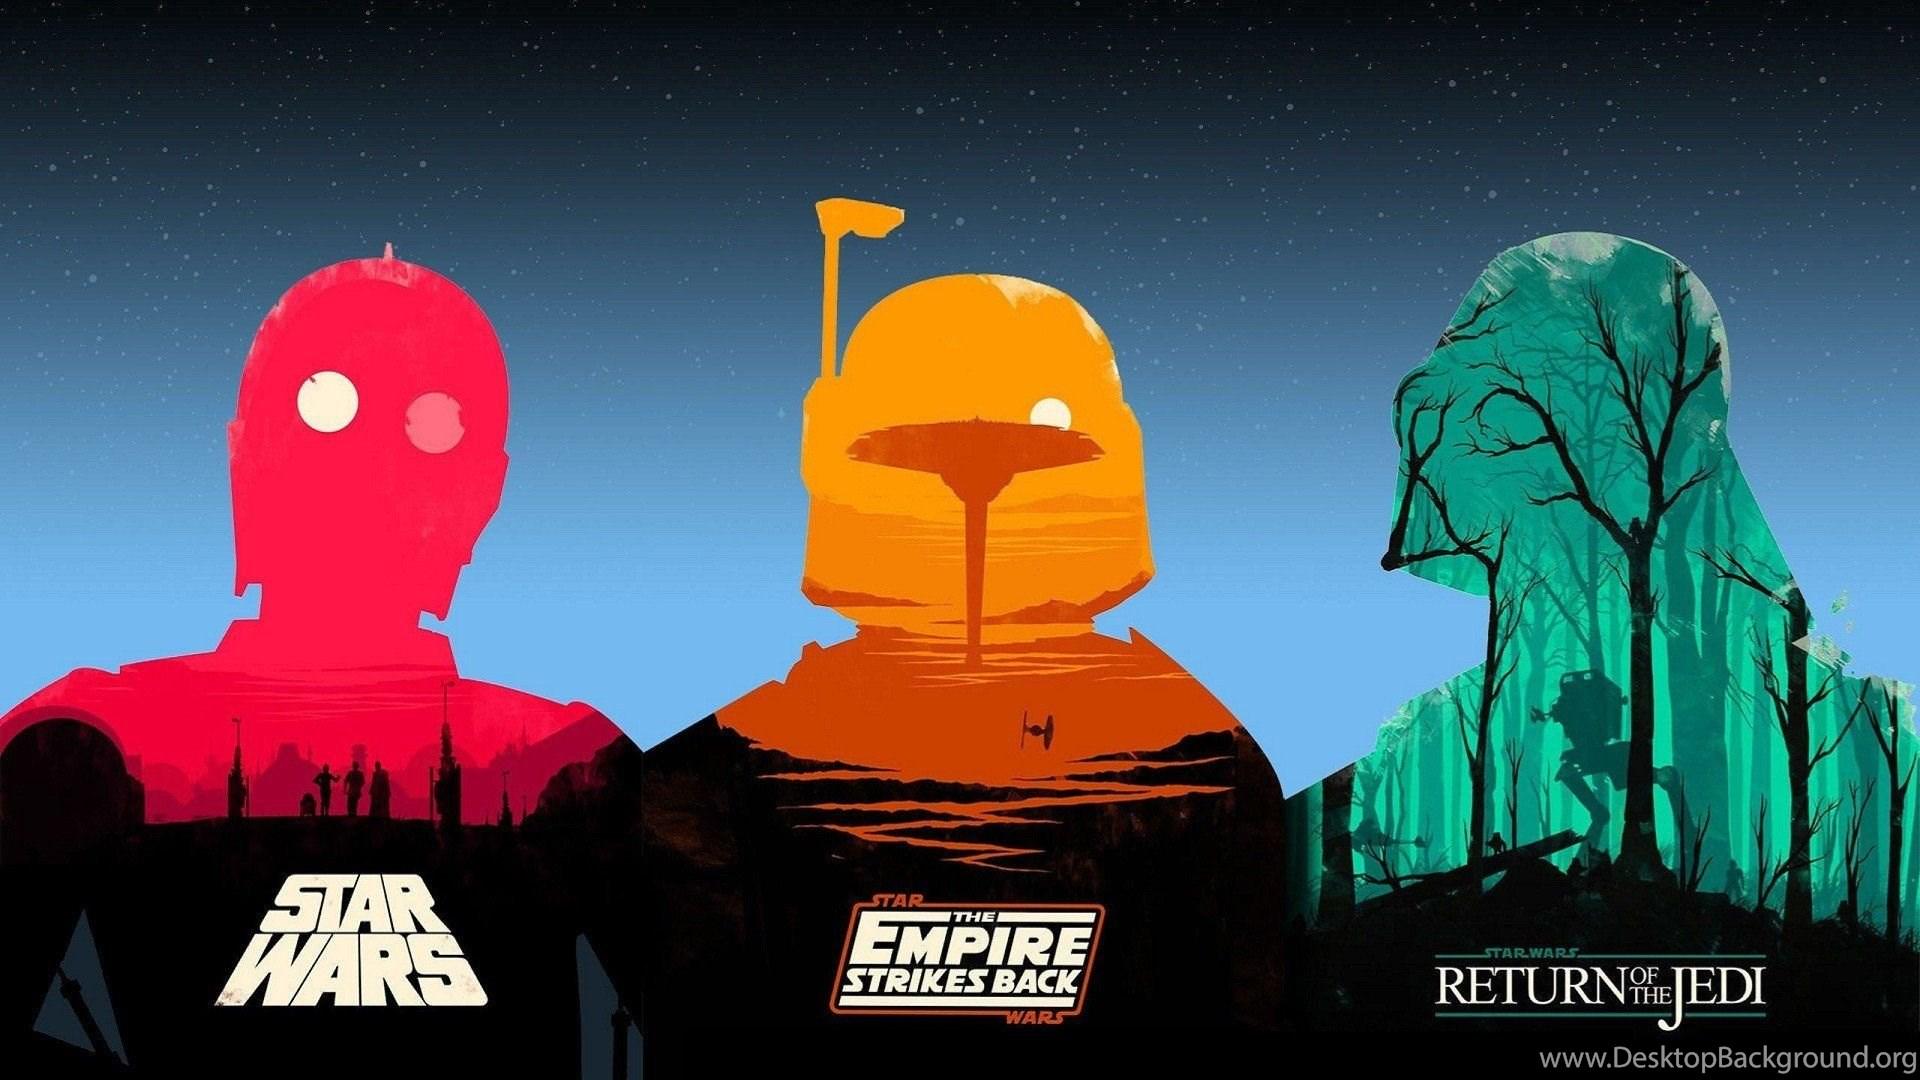 Star Wars Star Wars Episode V The Empire Strikes Back Star Wars